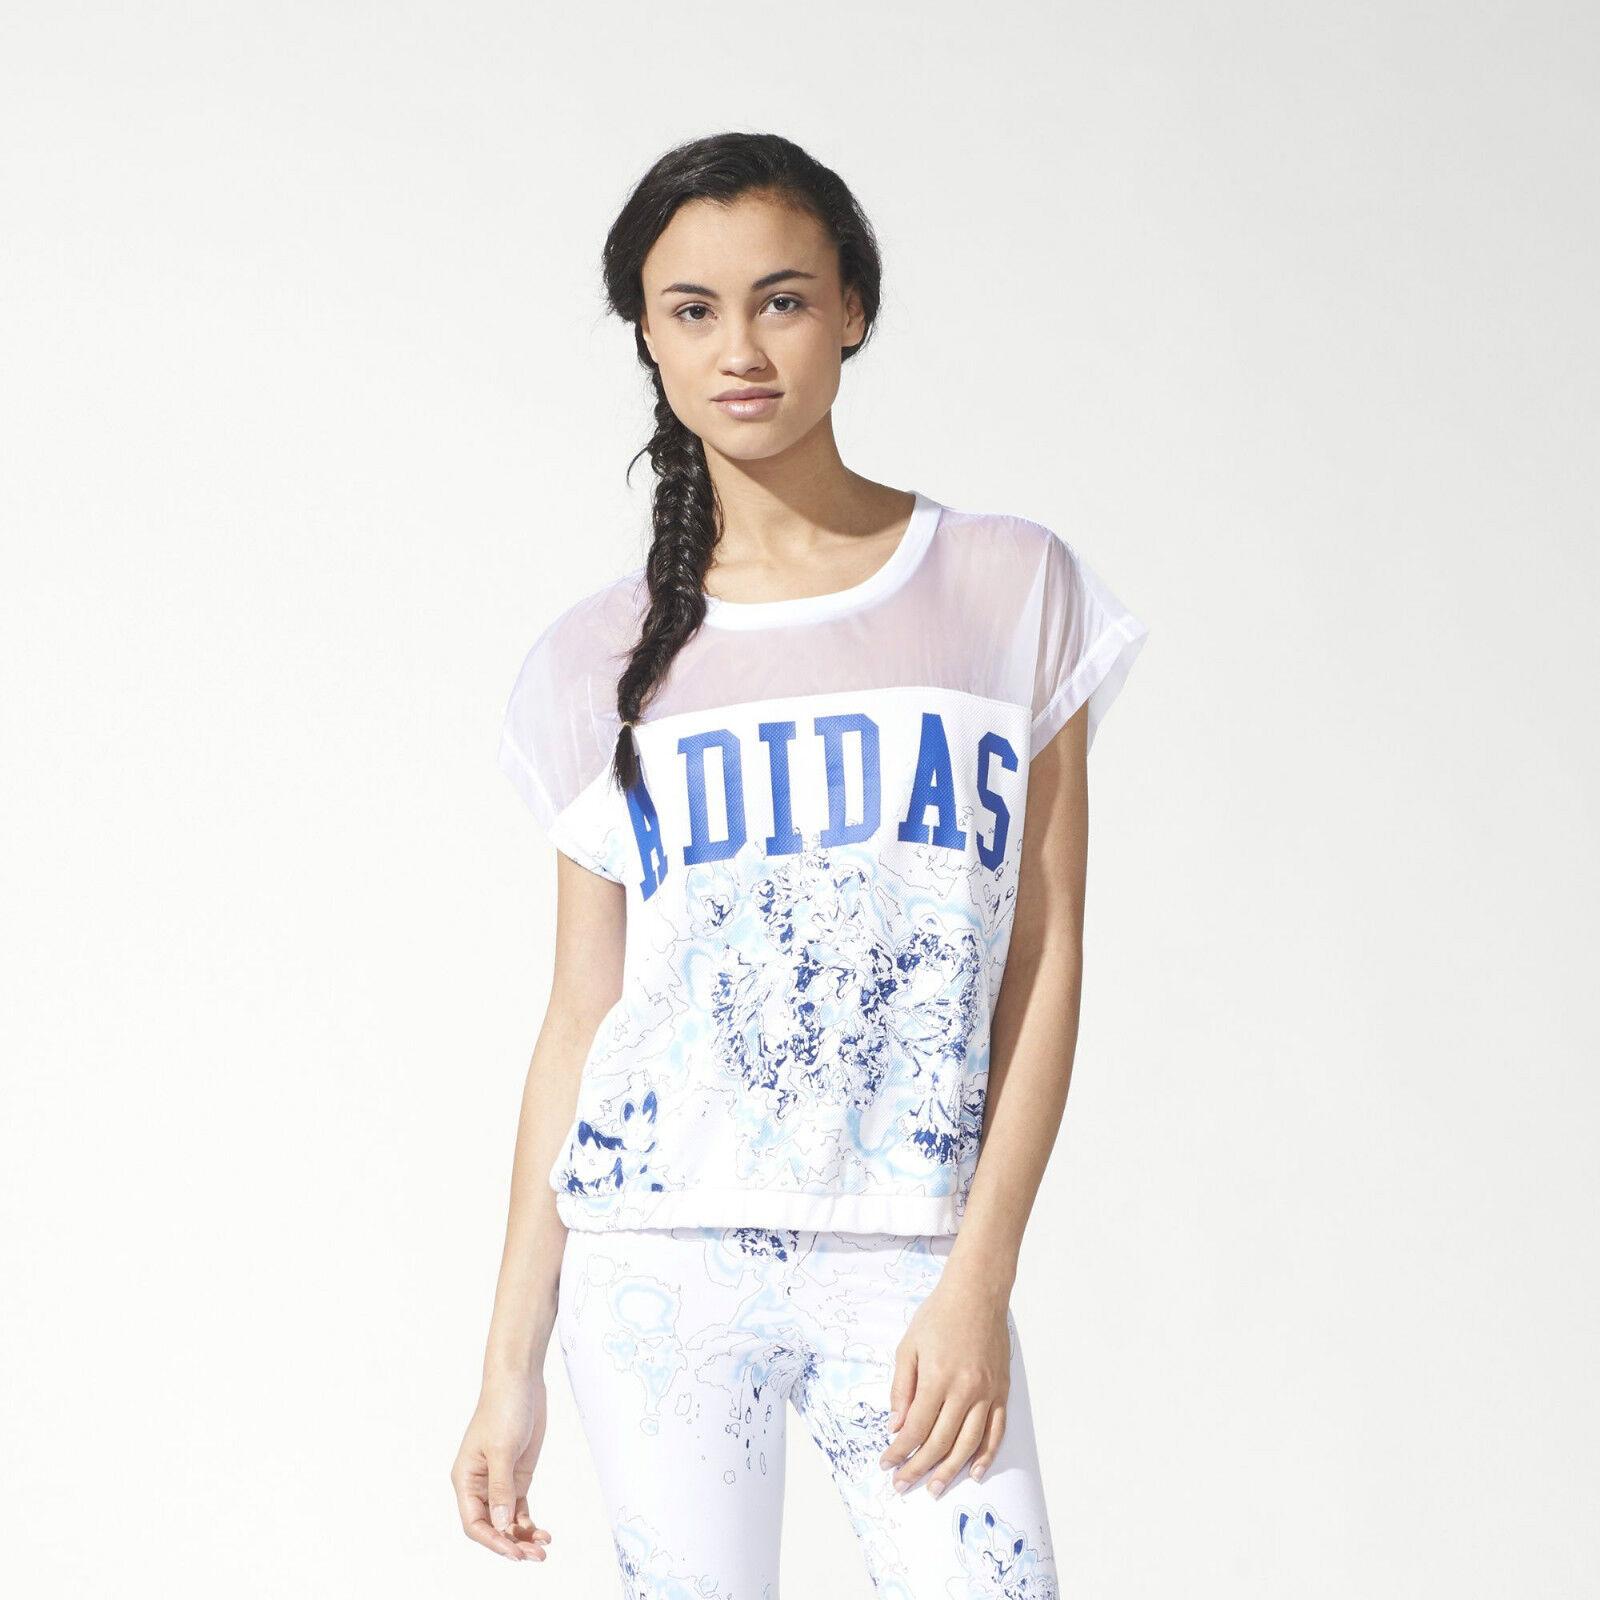 Adidas Originals W London Printed Weiß Tee Größe New ID S19981 (549)